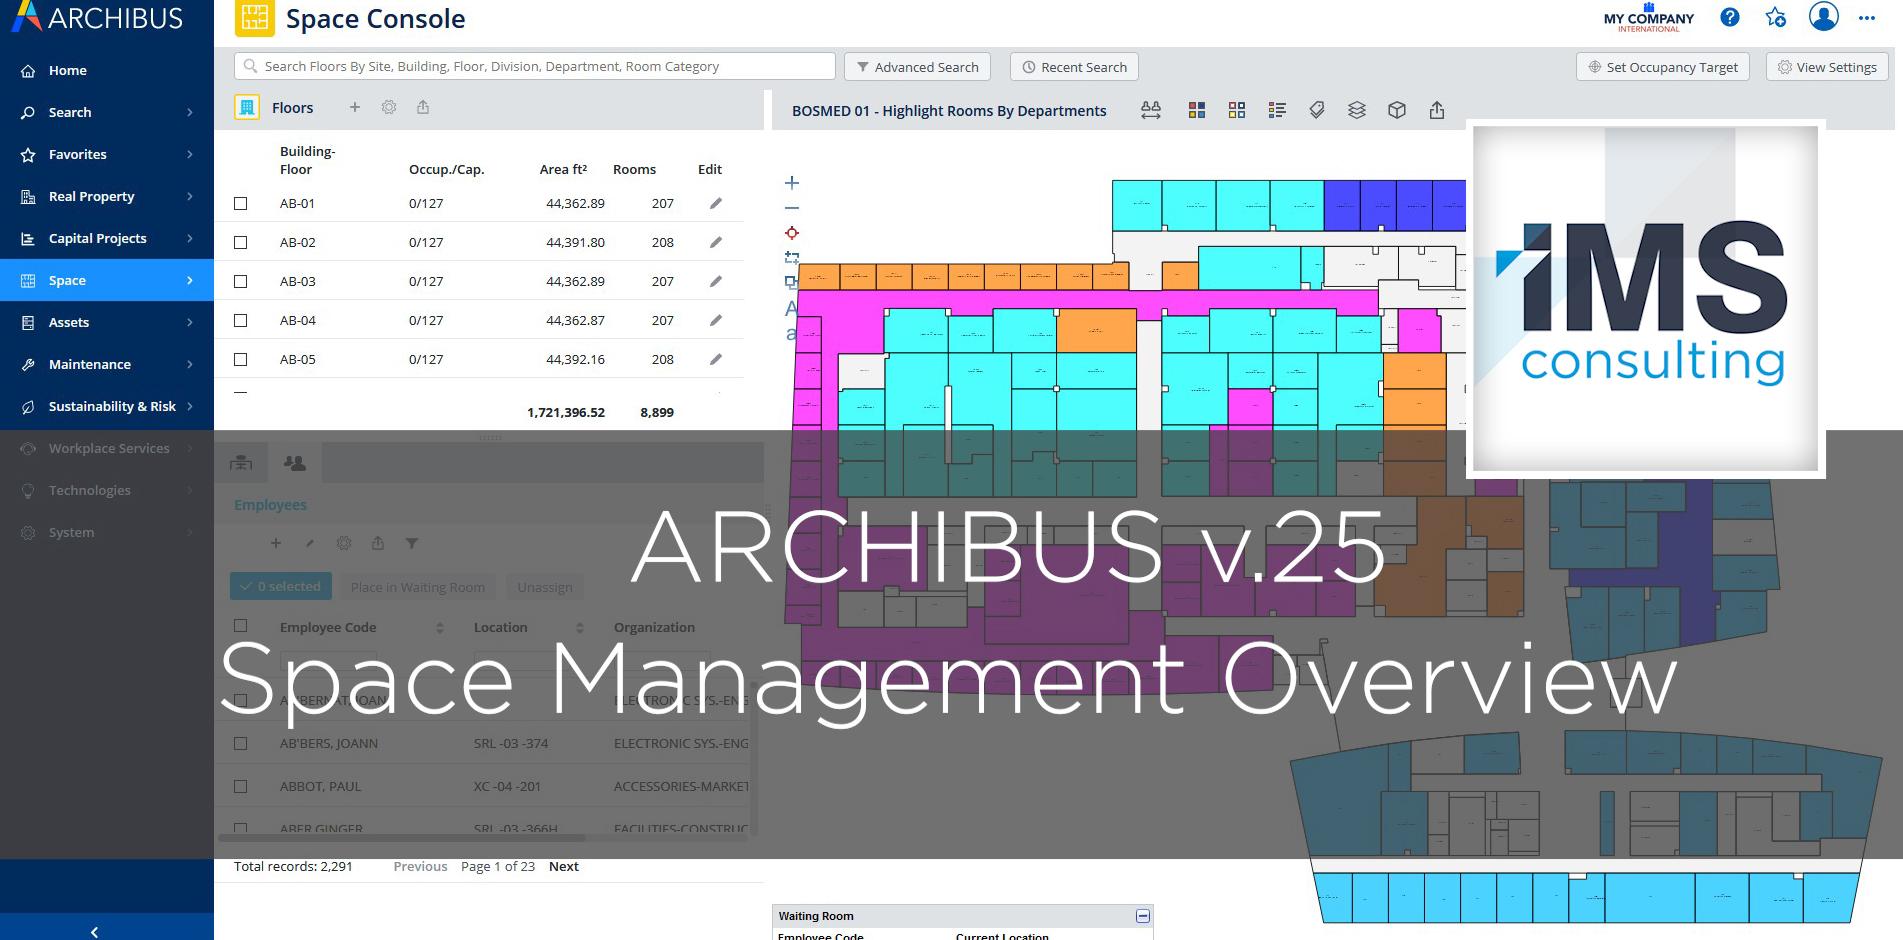 ARCHIBUS Space Management v.25